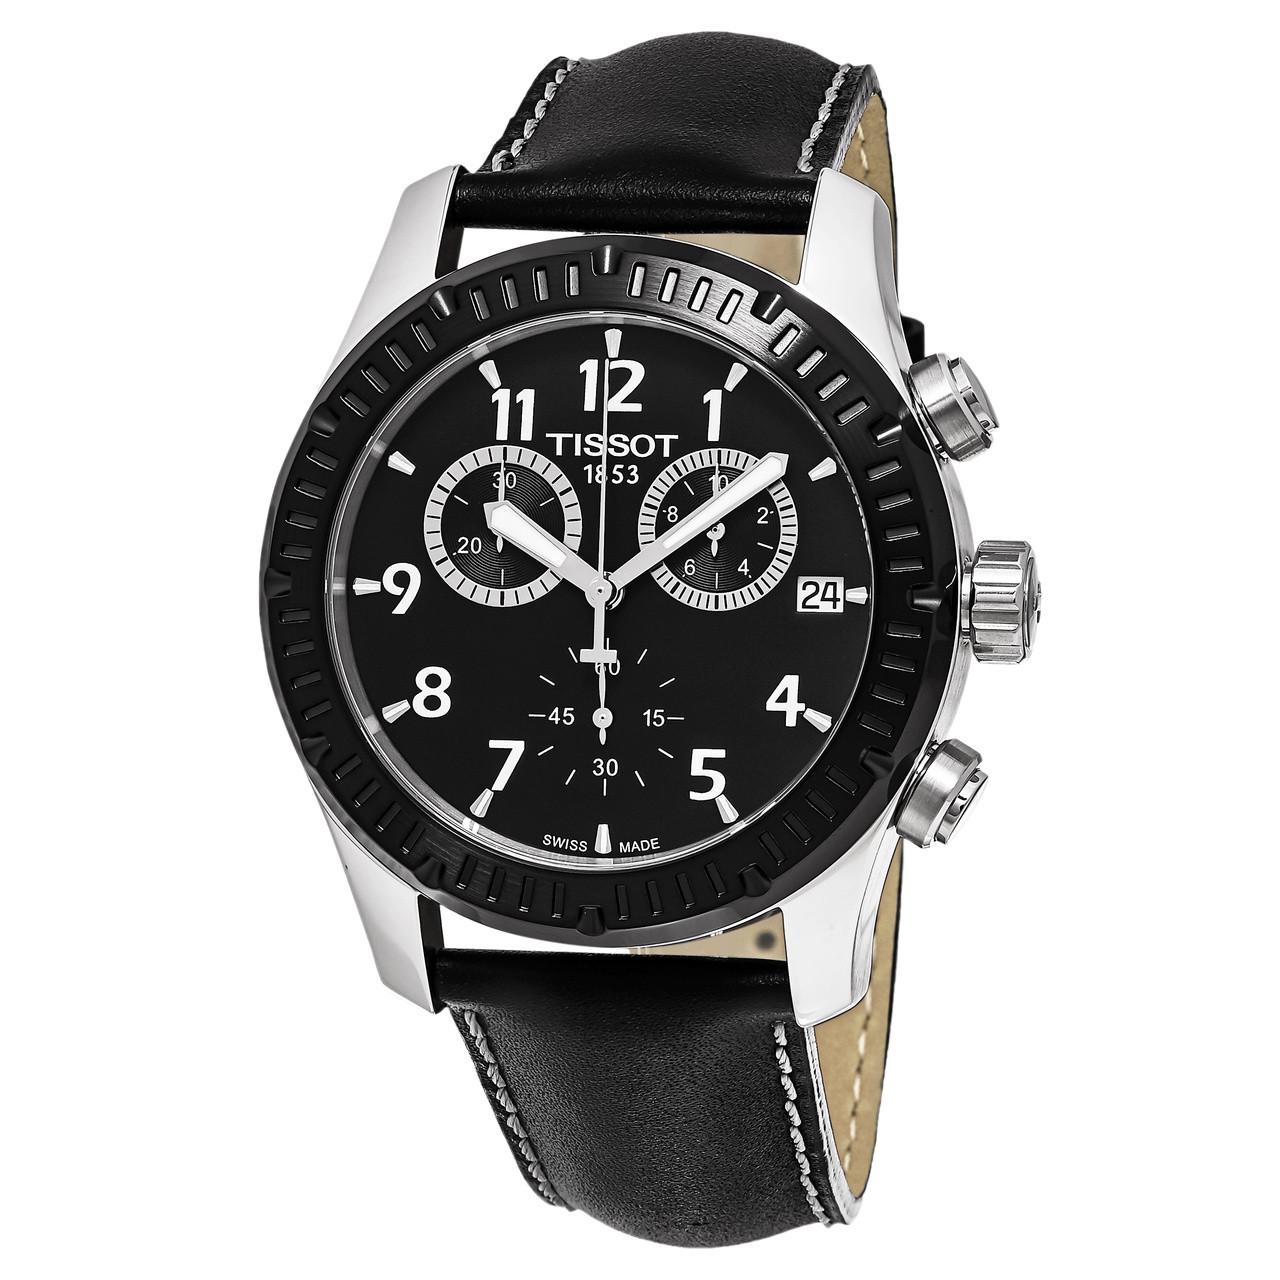 c1967e70a56 Tissot Men's T039.417.26.057.00 V8 Black Dial Chronograph Swiss ...